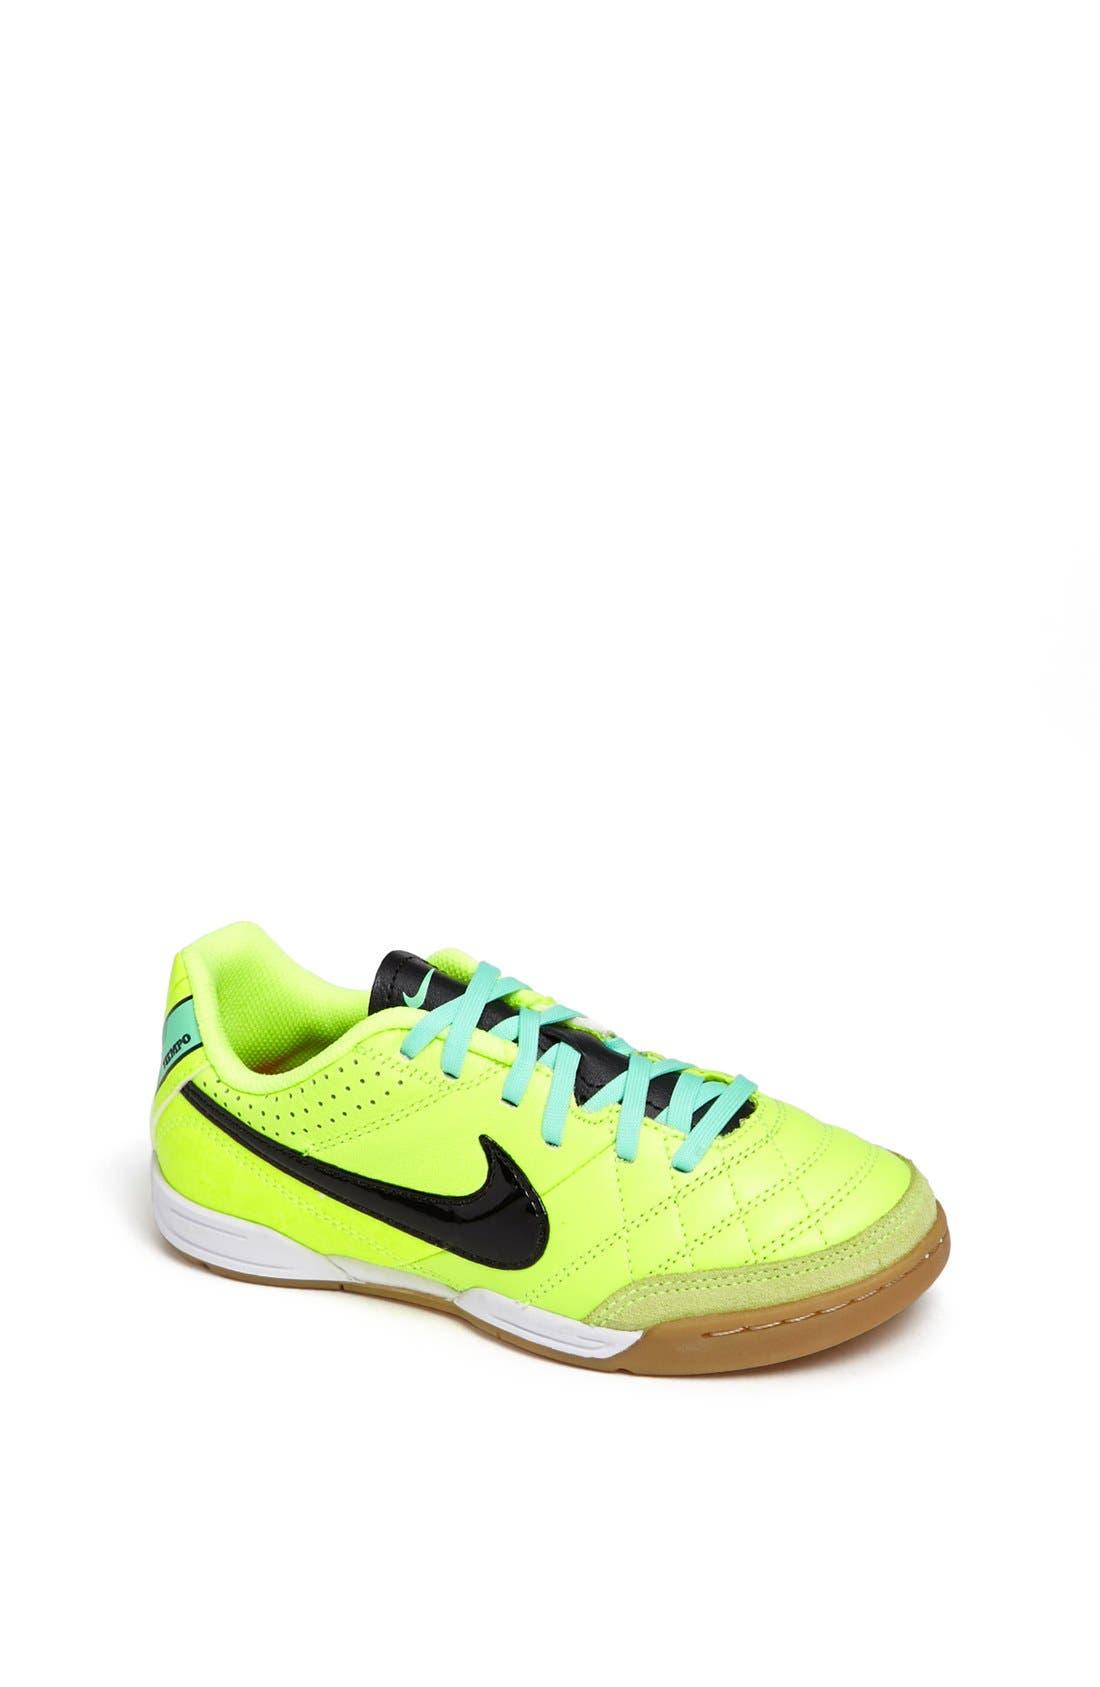 Main Image - Nike 'Jr. Tiempo Natural IV' Soccer Shoe (Toddler, Little Kid & Big Kid)